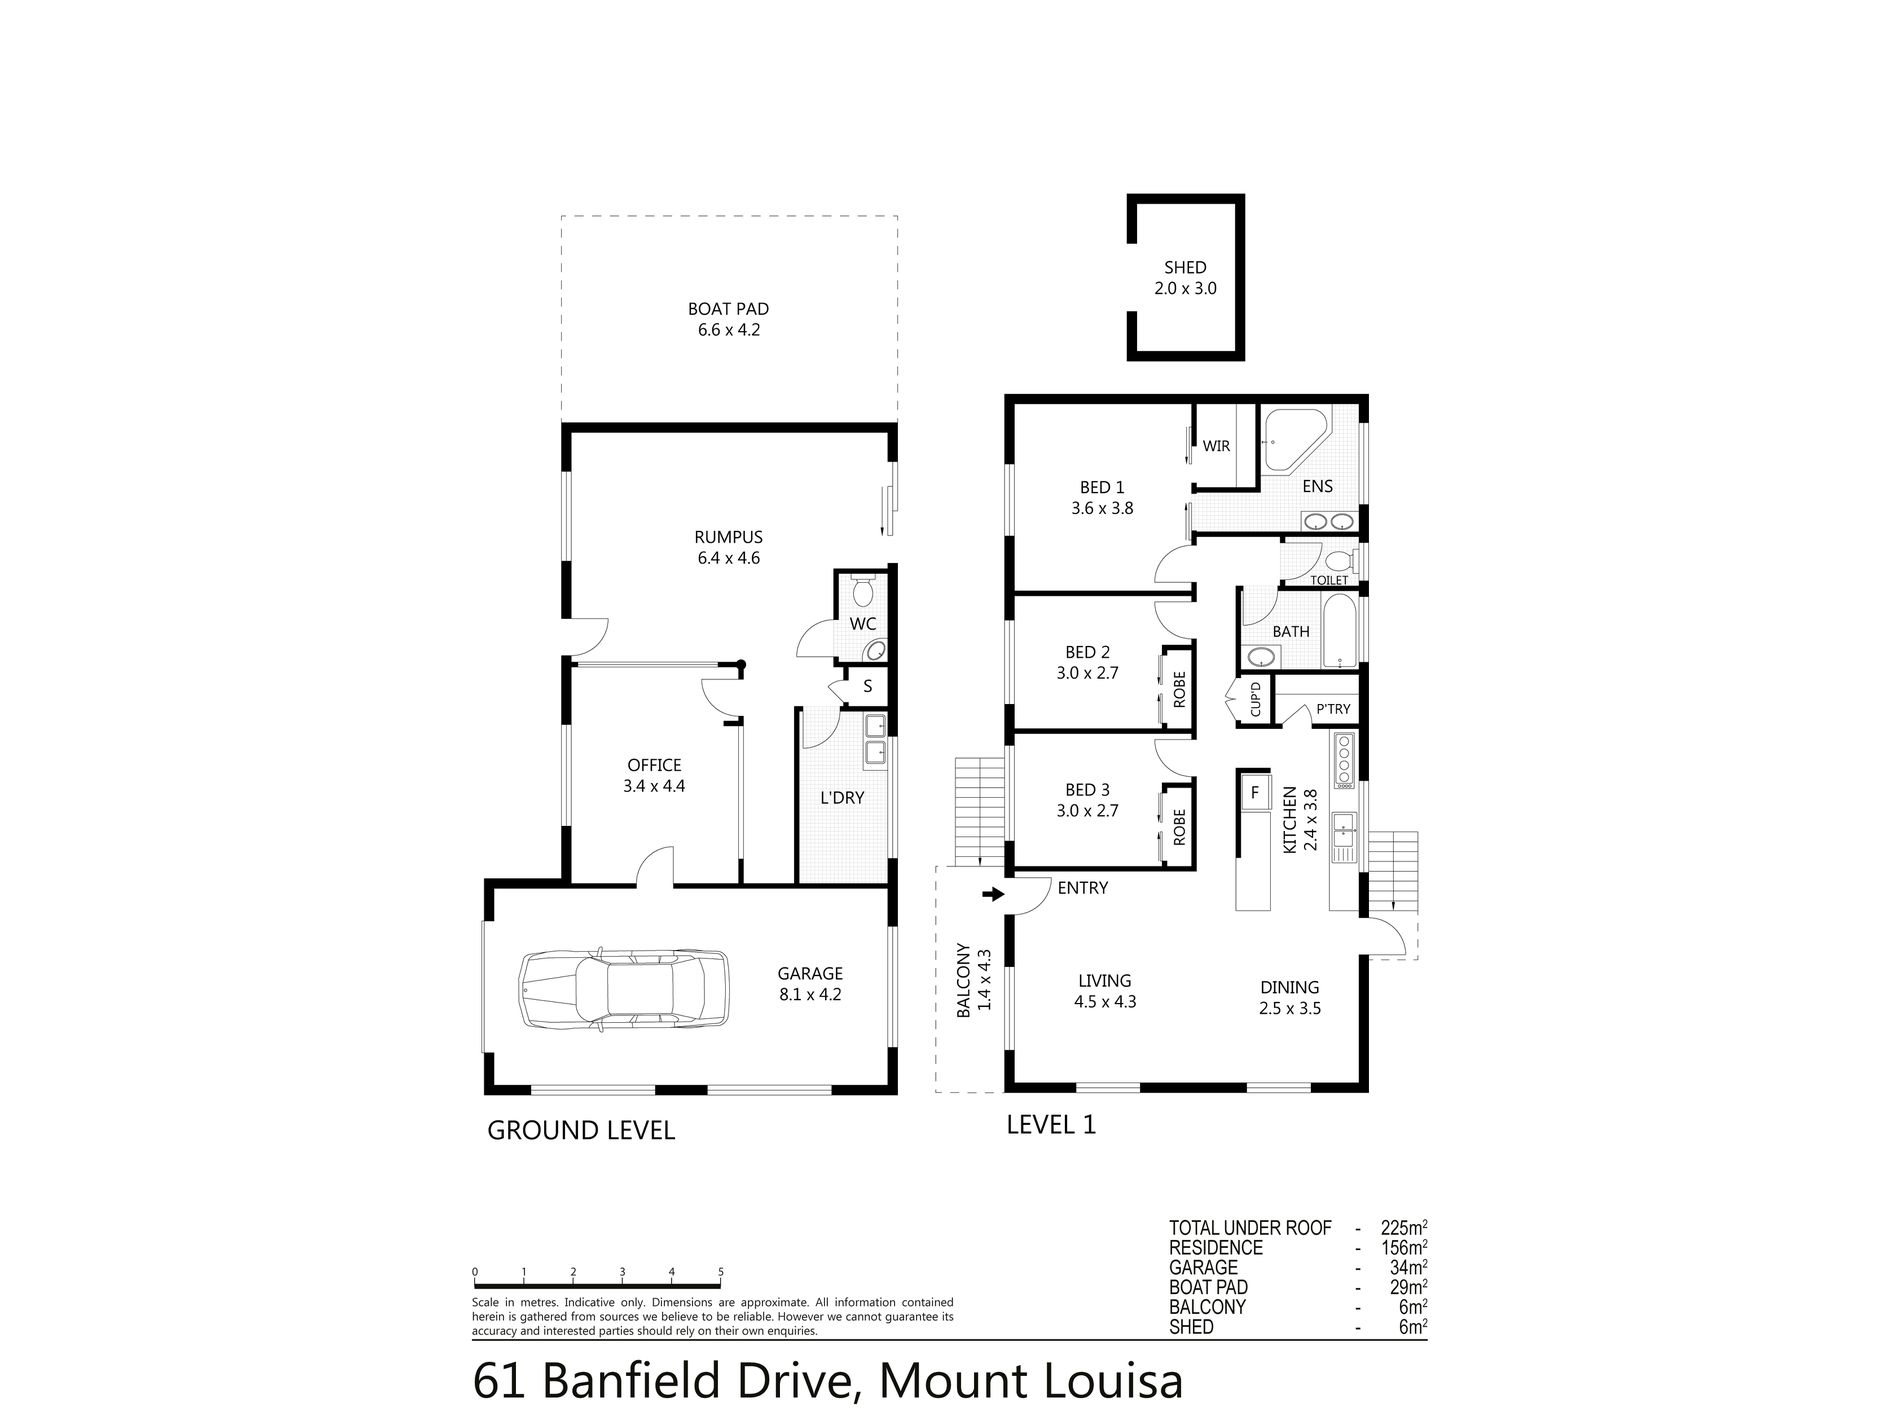 61 Banfield Drive, Mount Louisa